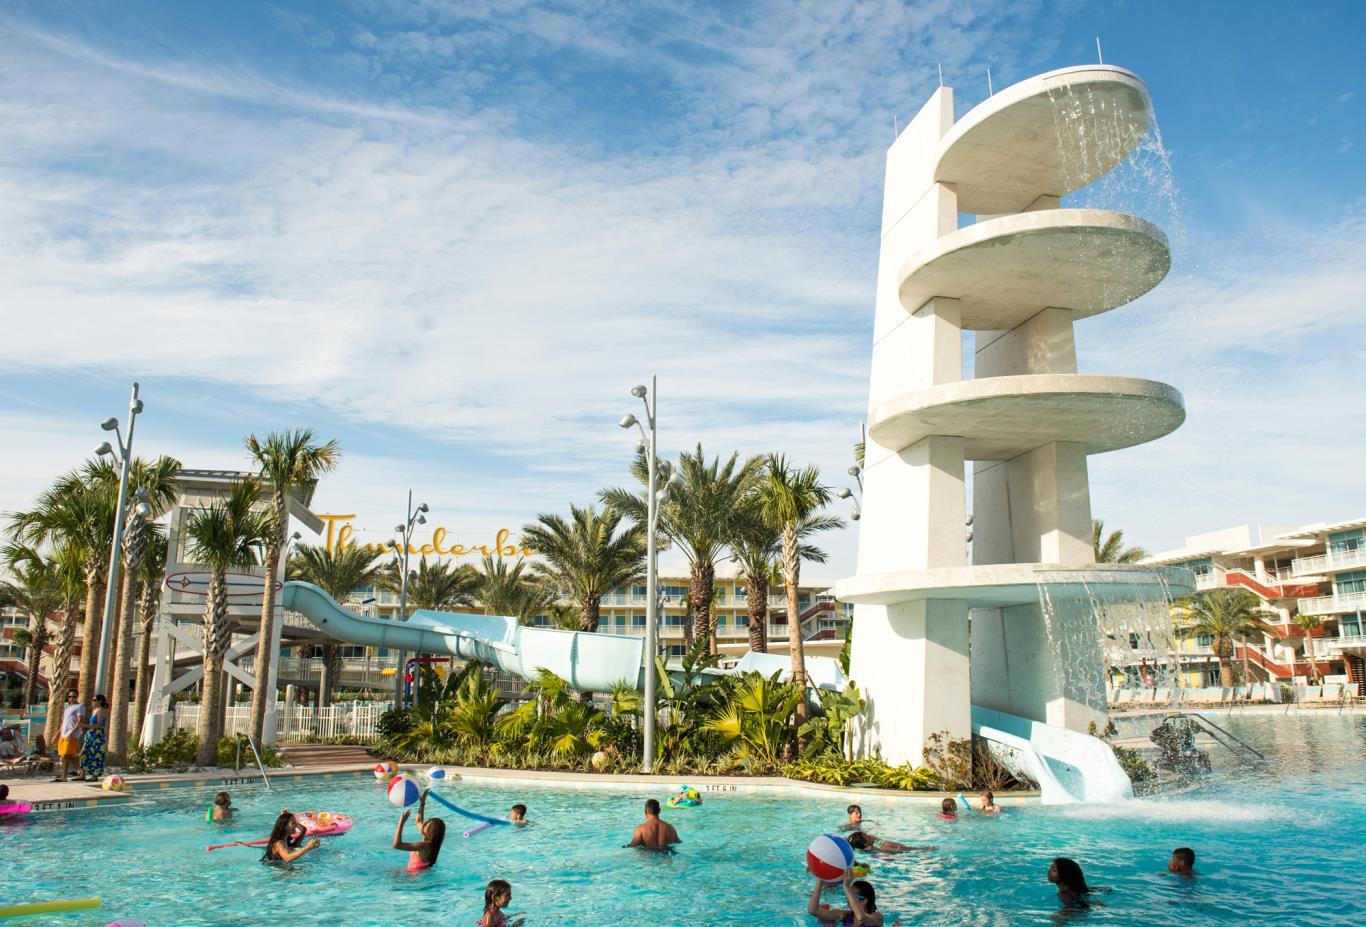 Cabana Courtyard Pool